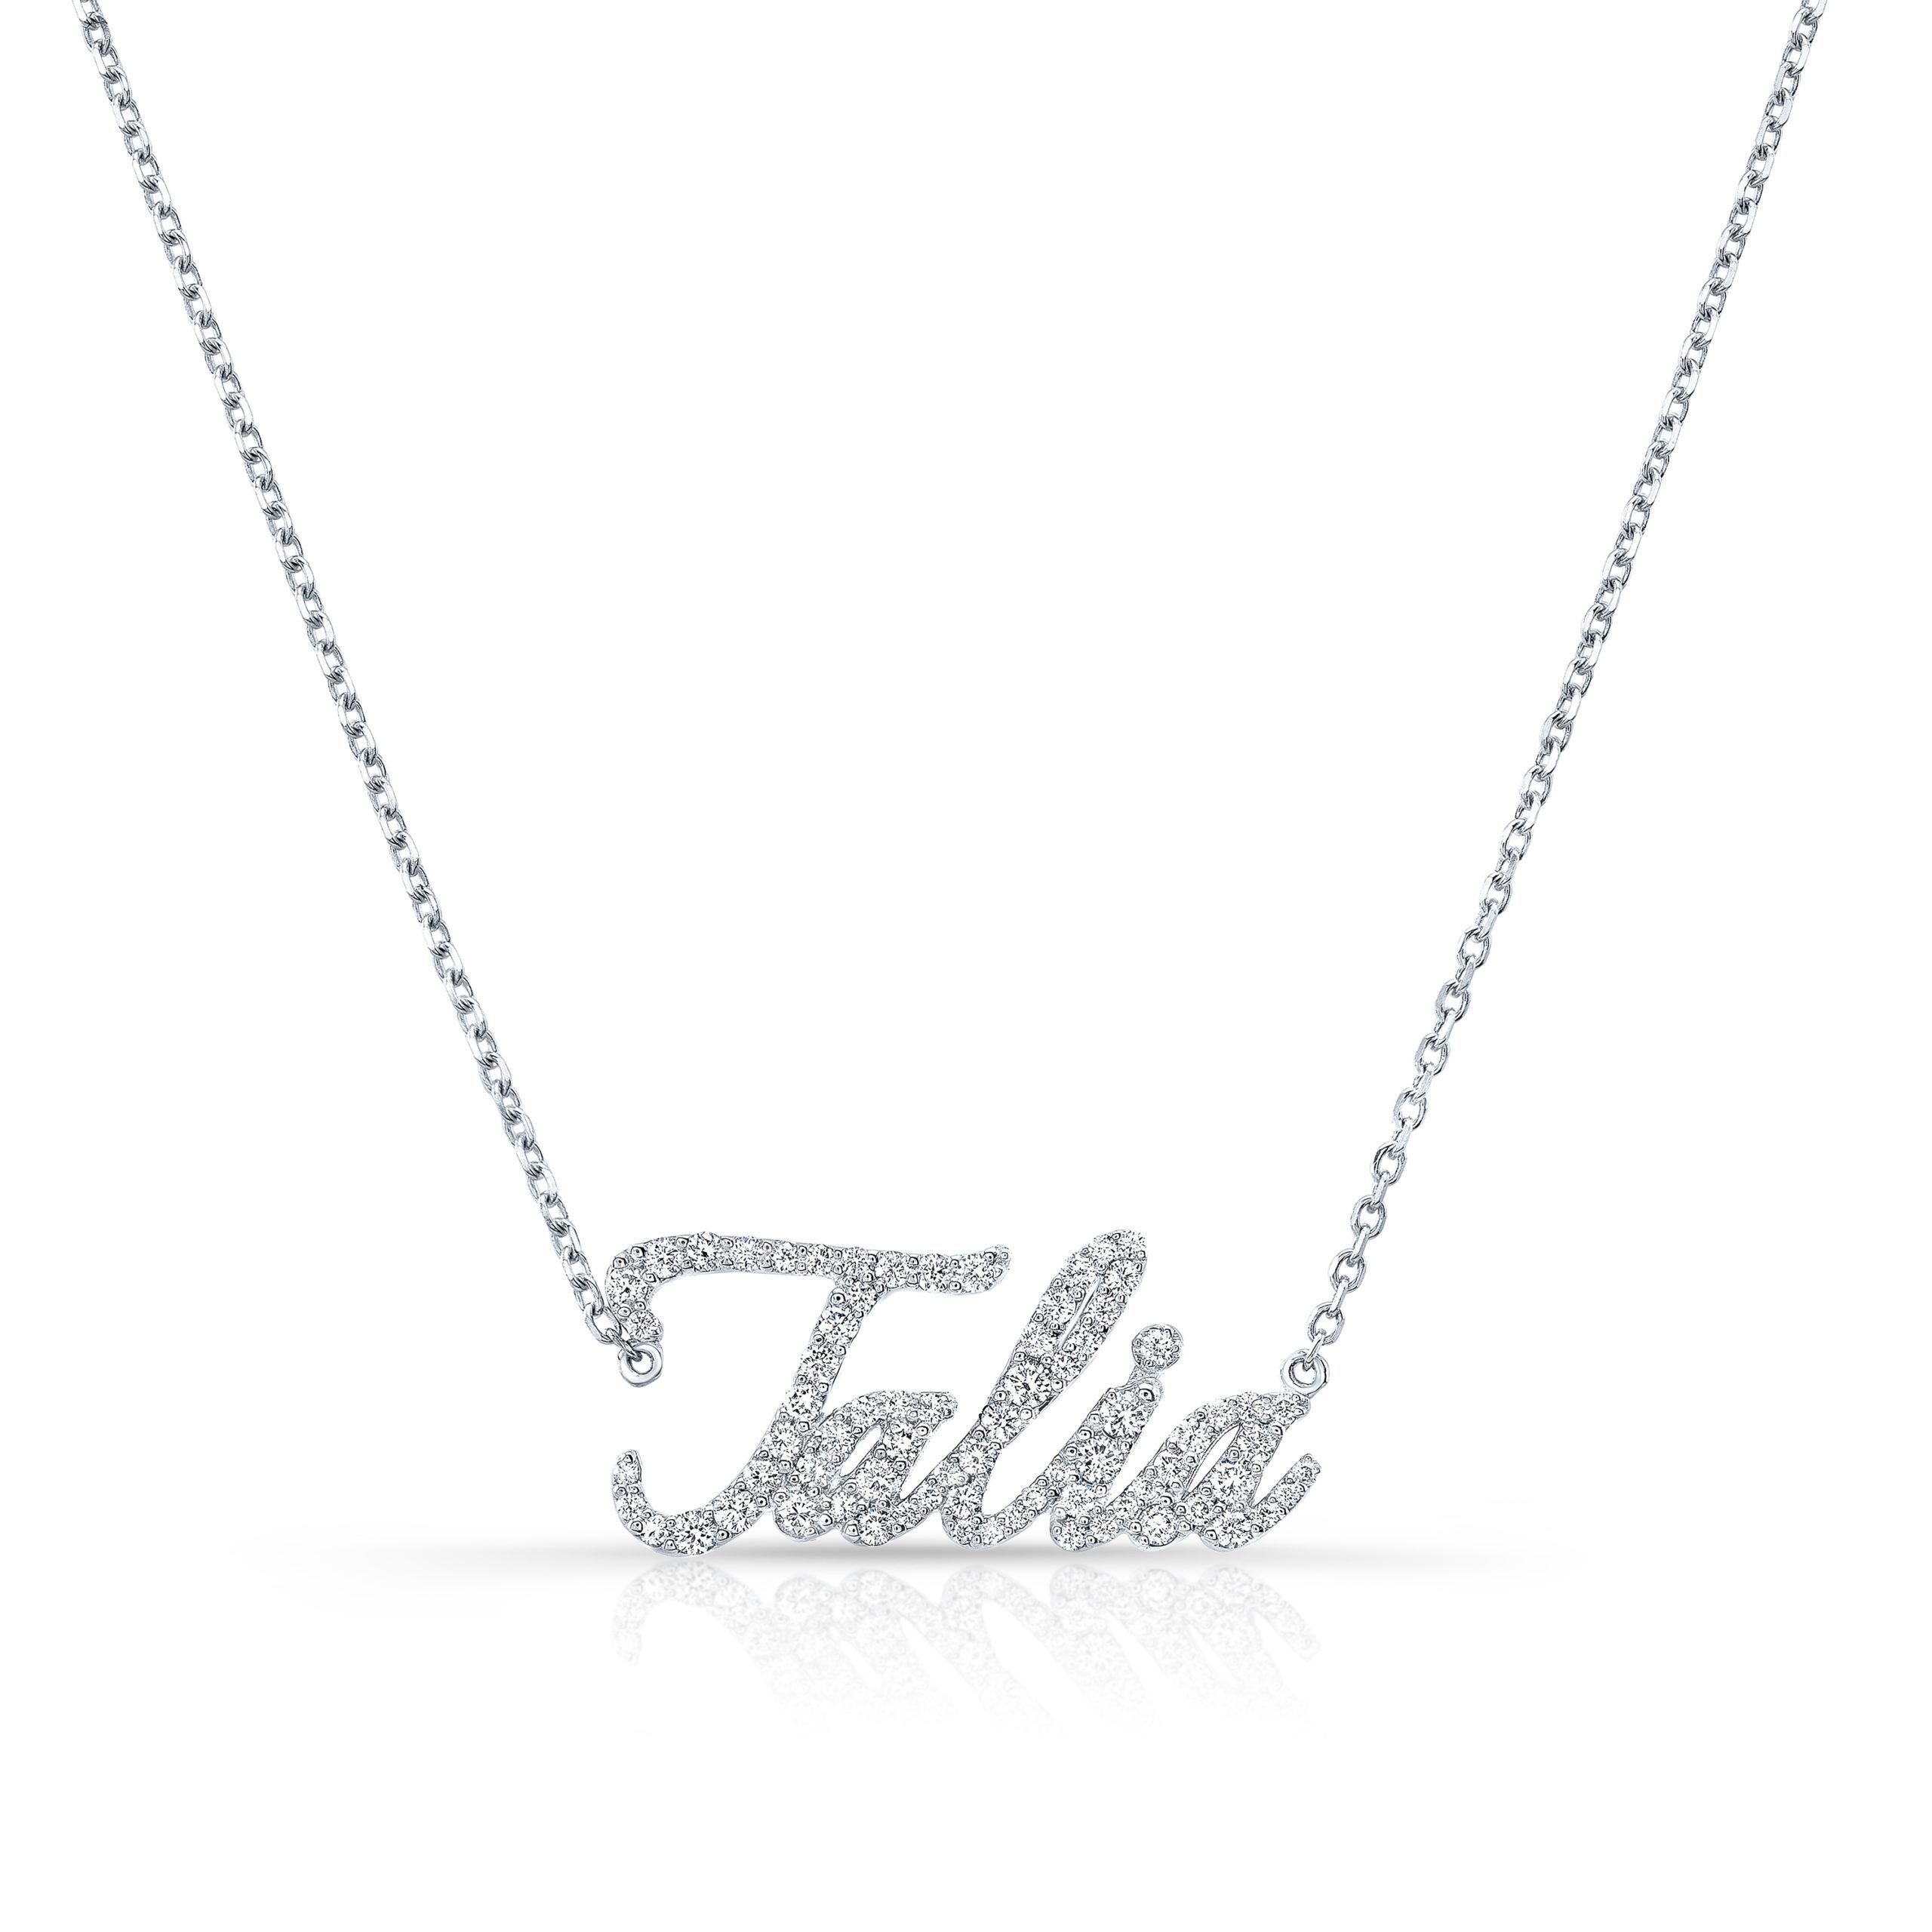 Cursive Nameplate Necklace